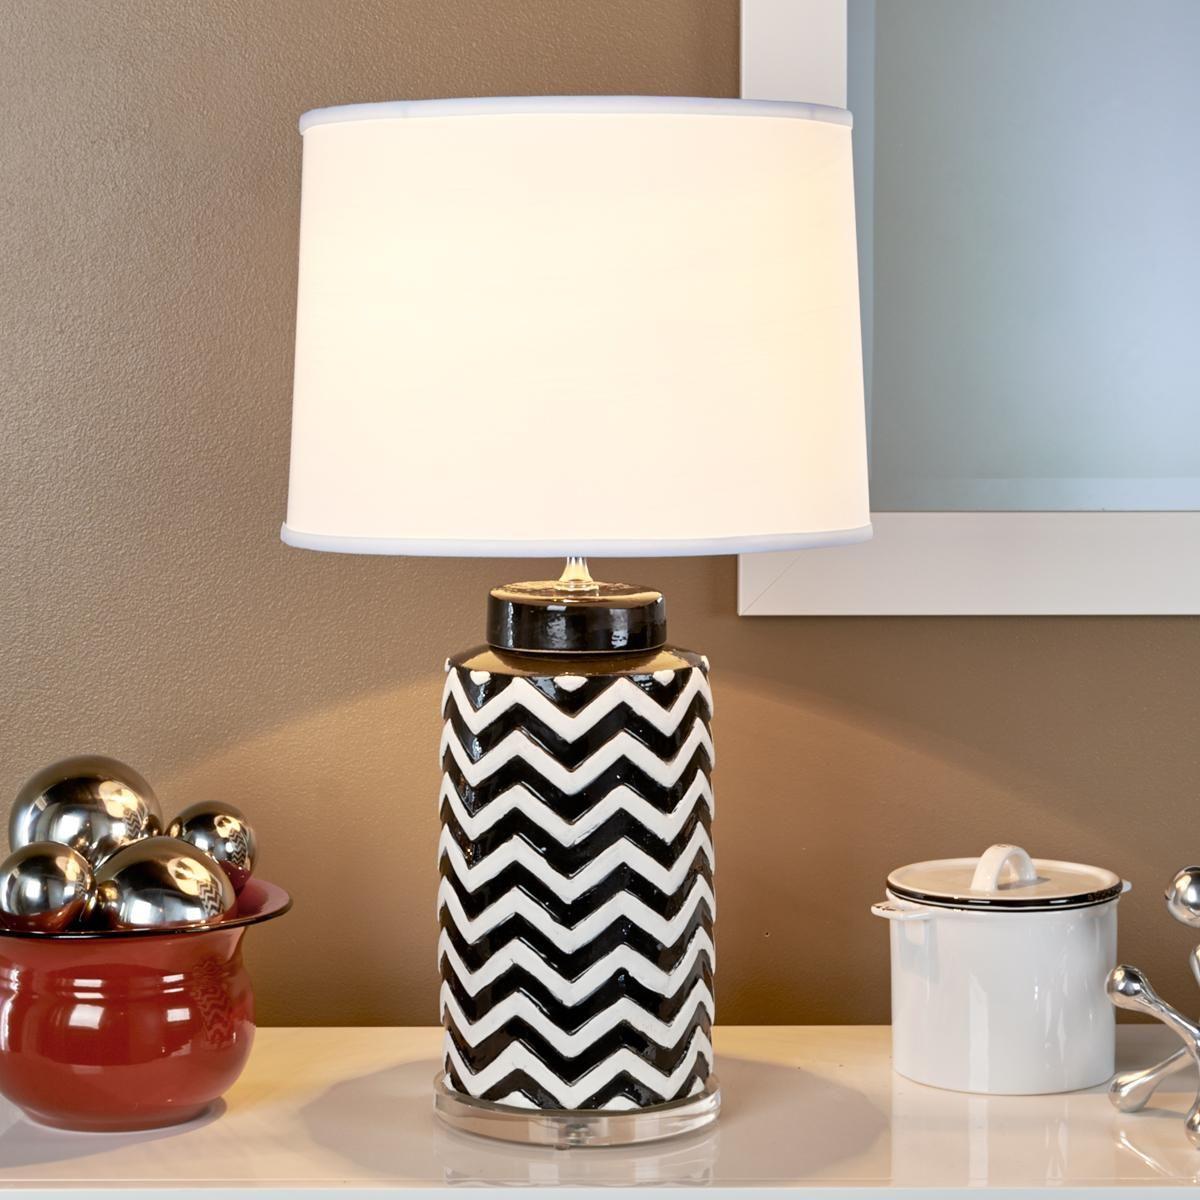 Black And White Chevron Table Lamp It S Black Amp White